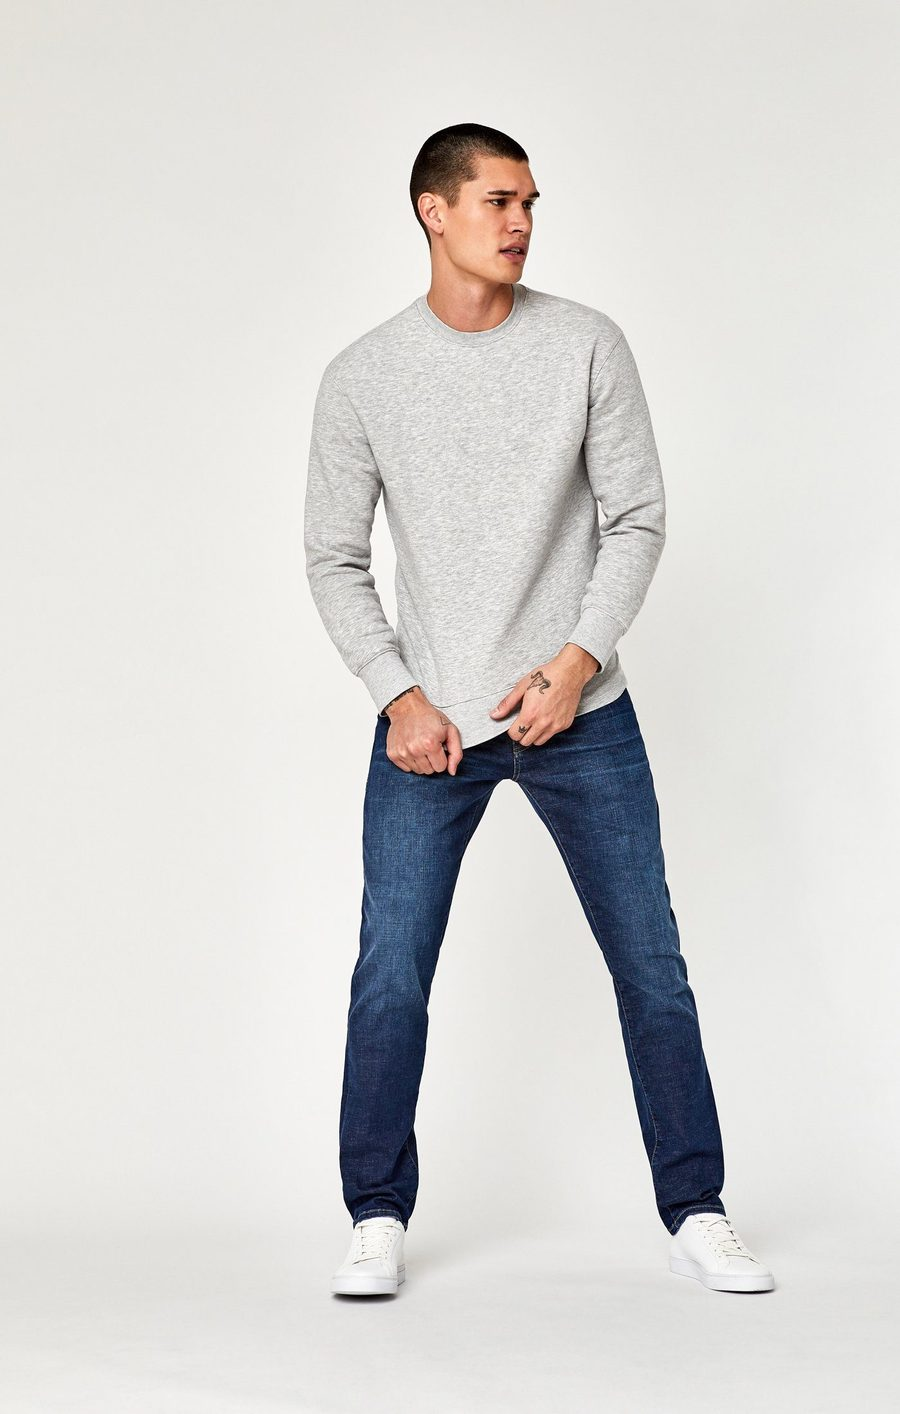 James Skinny Jeans in Dark Brushed Cashmere